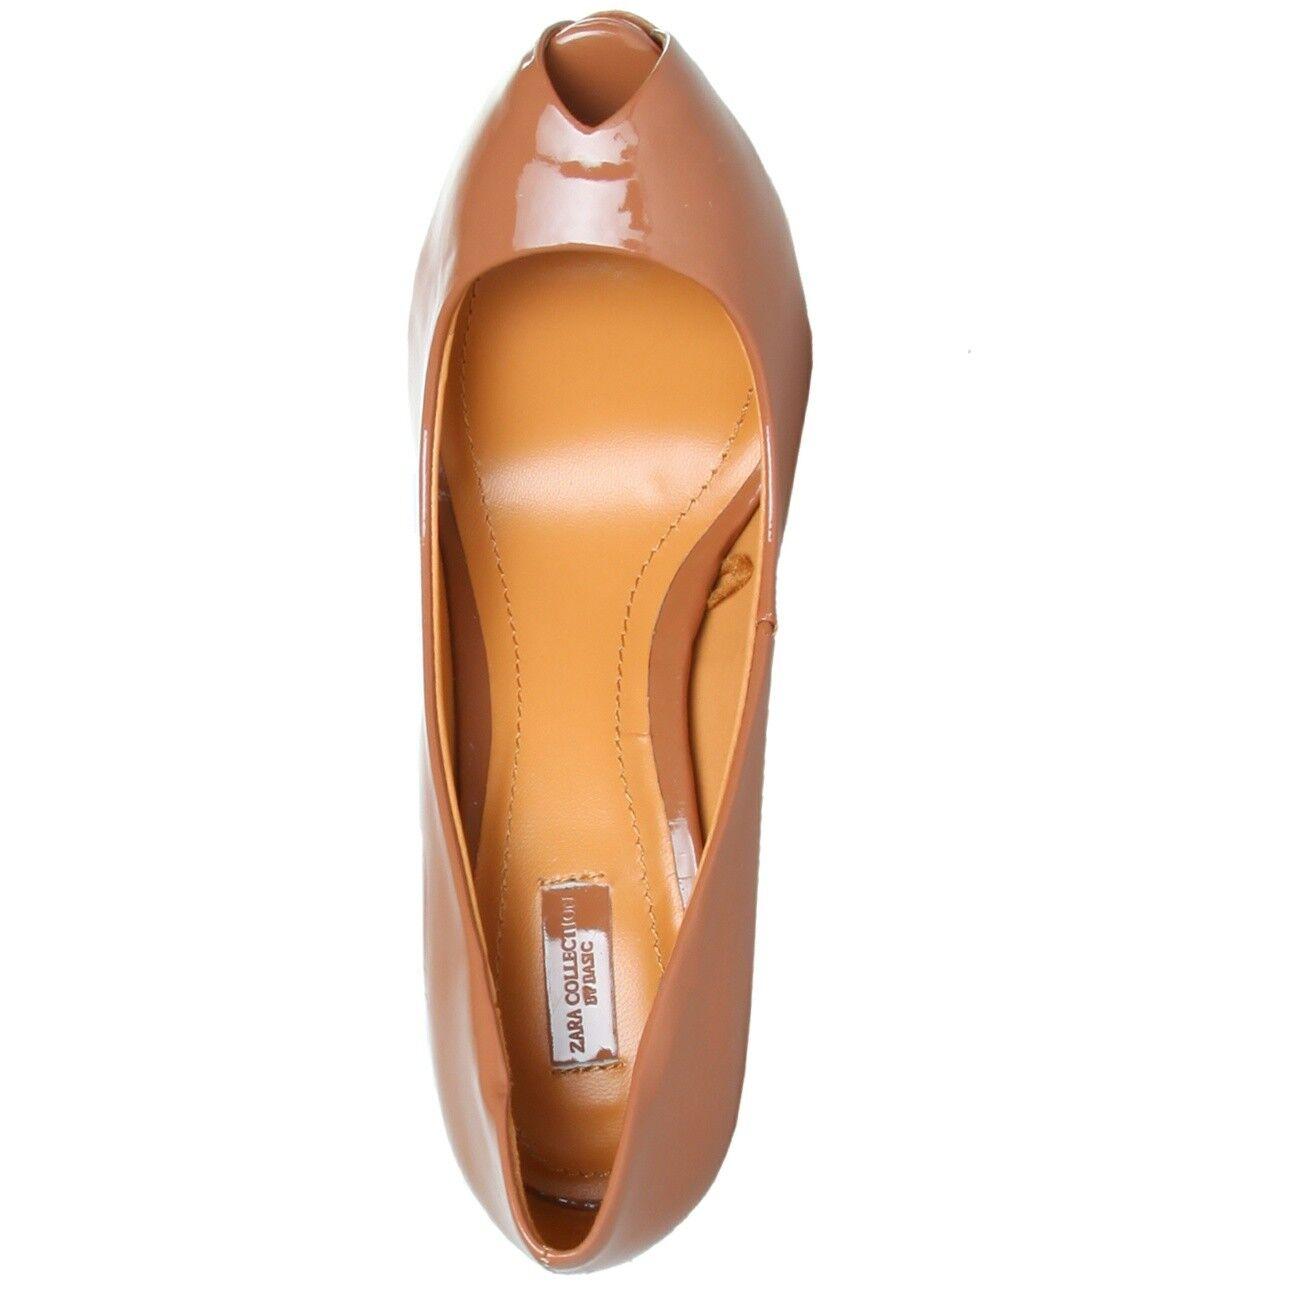 ZARA Peep 2158_101_MAQUILLAJE Damenschuhe Schuhe Pumps High Heels, Peep ZARA Toes, EUR 38 1c8612